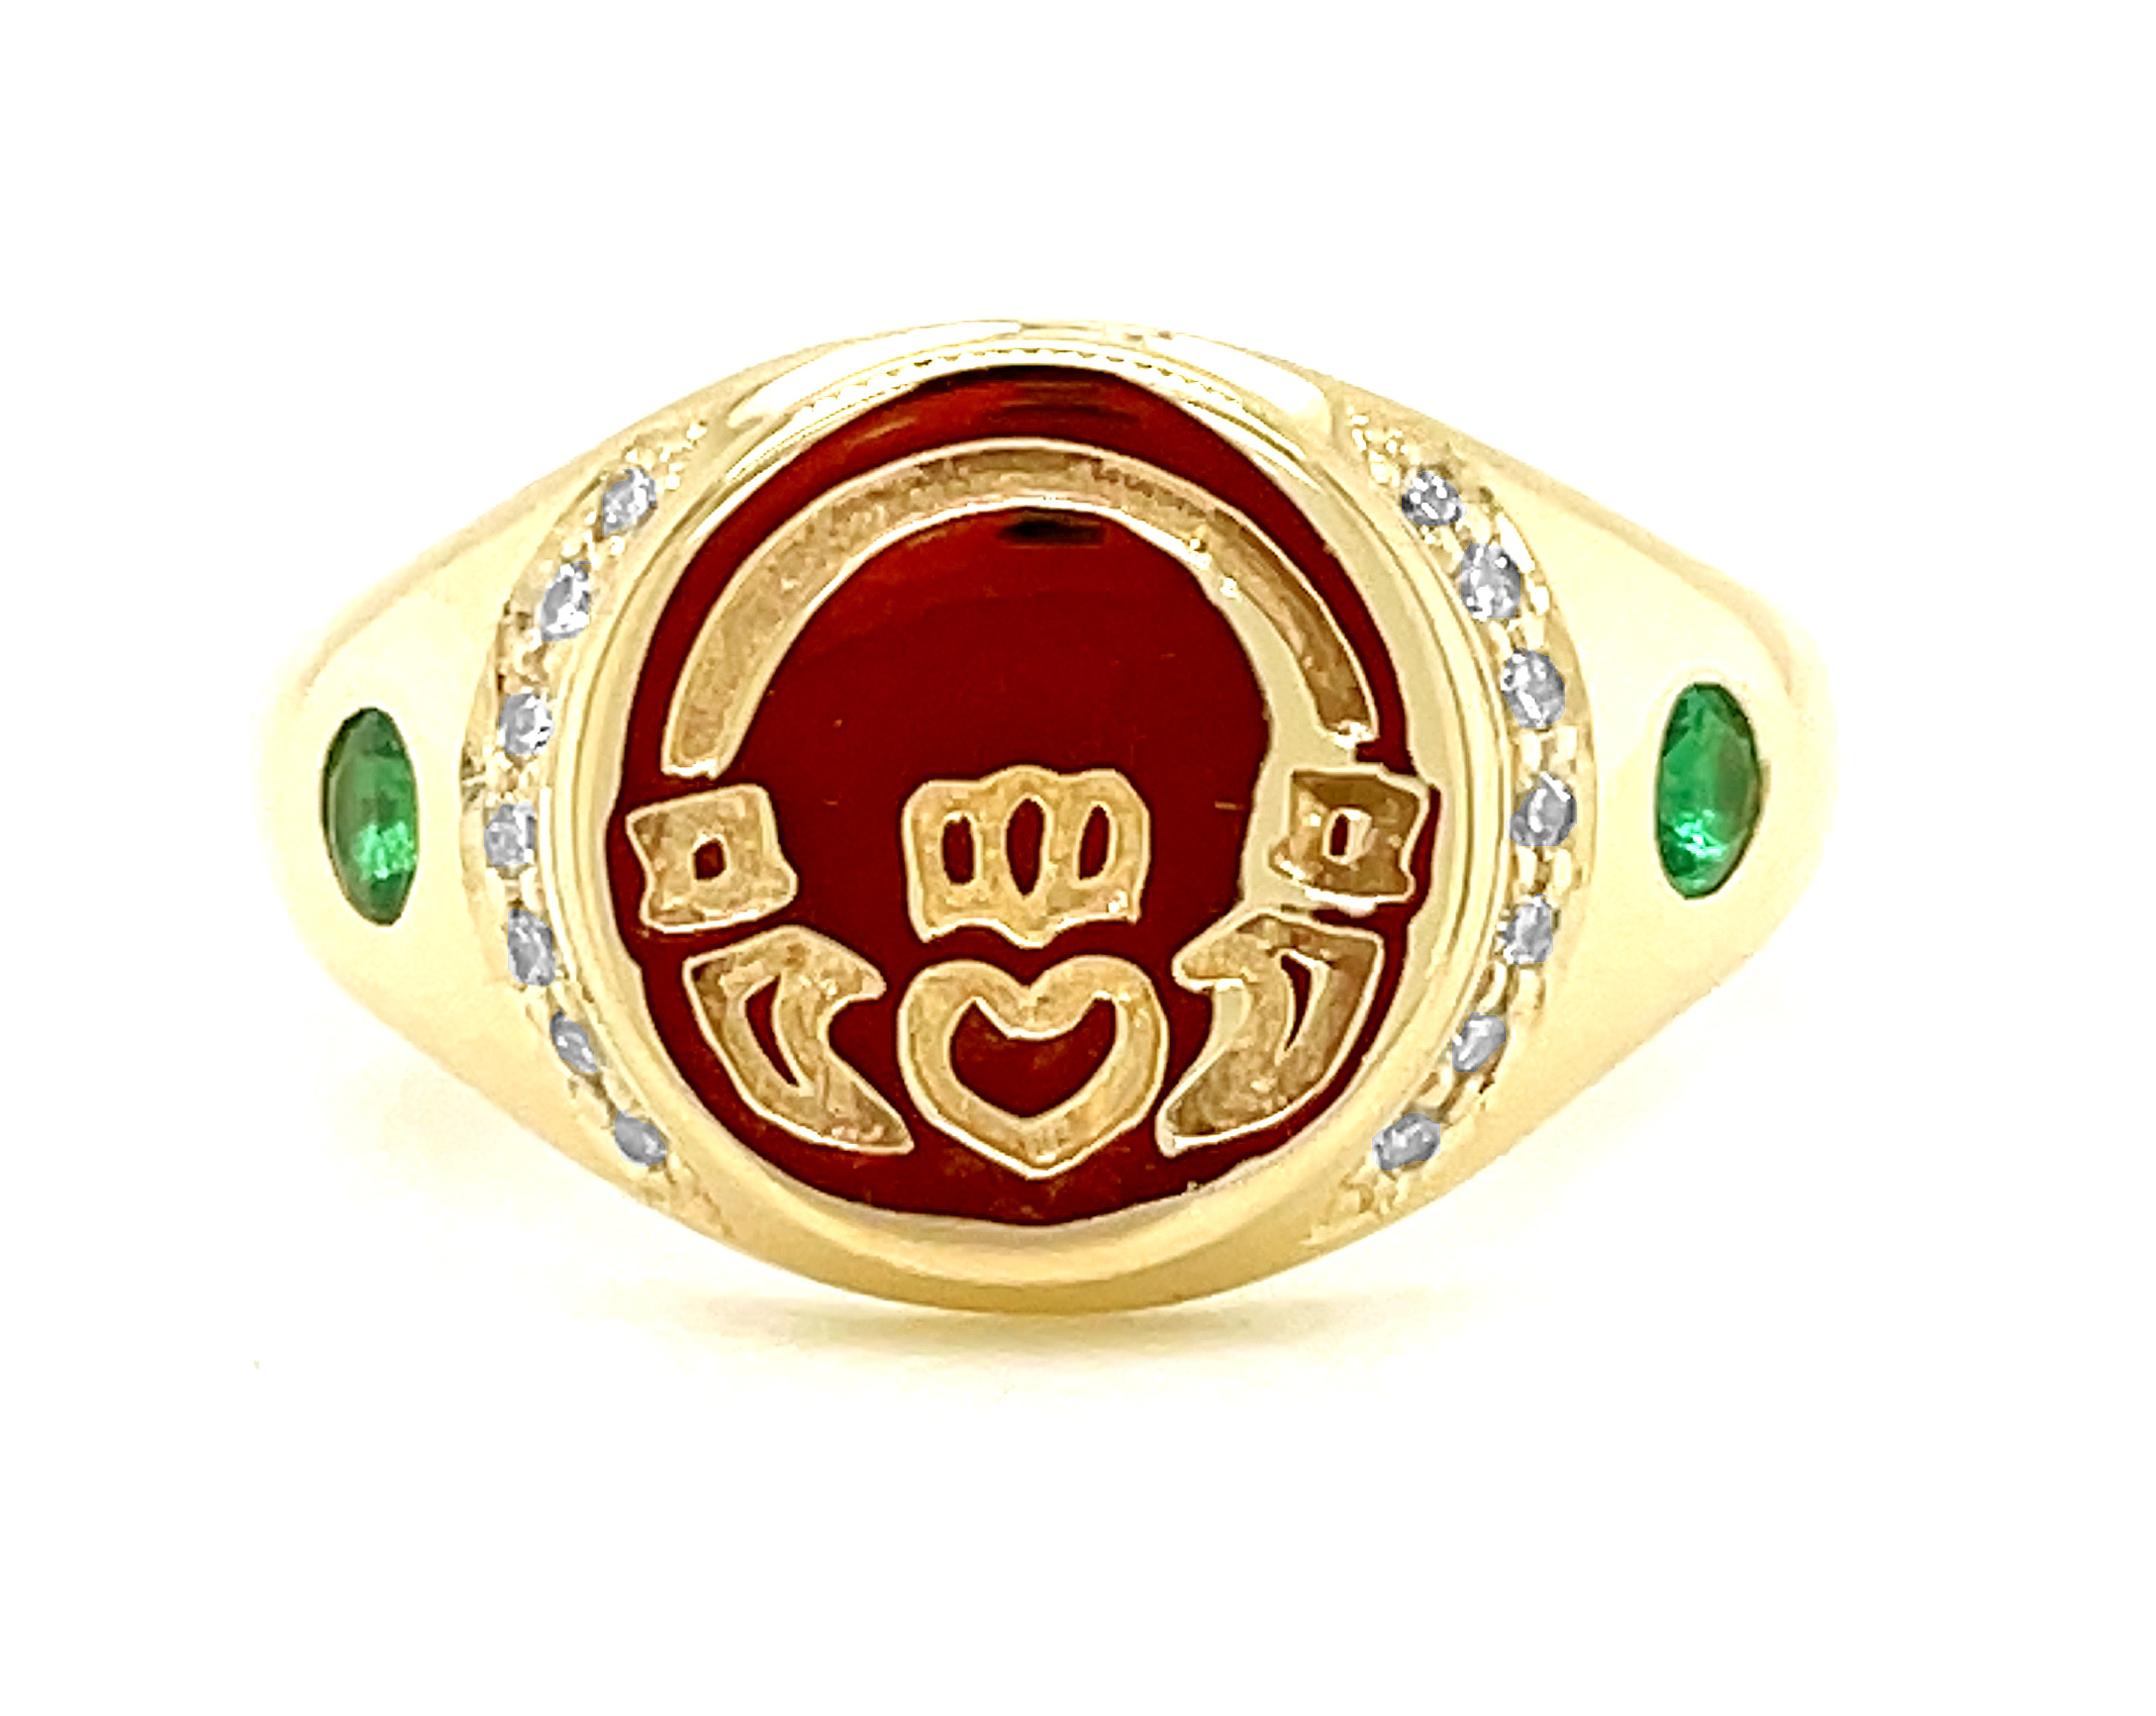 10k Yellow Gold Emerald & Diamond Claddagh Seal Ring